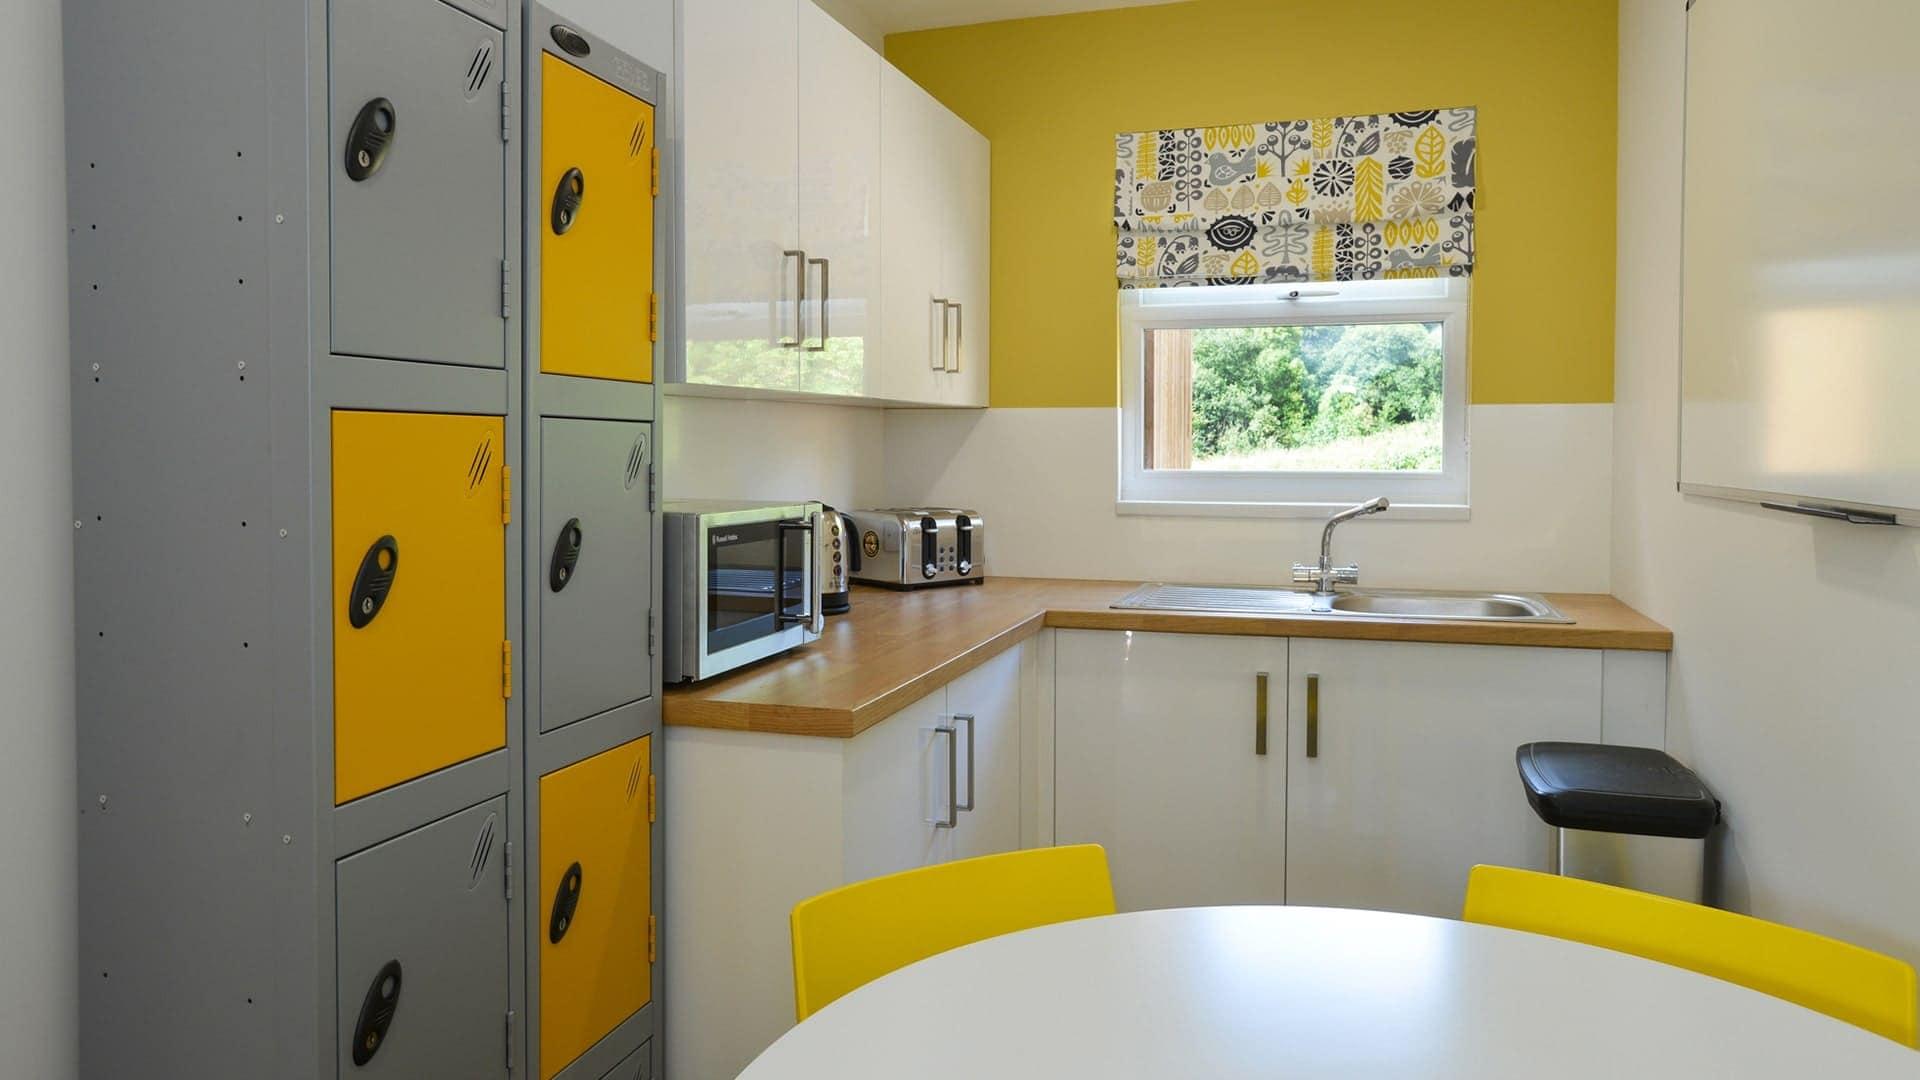 flame retardant blinds in school kitchen